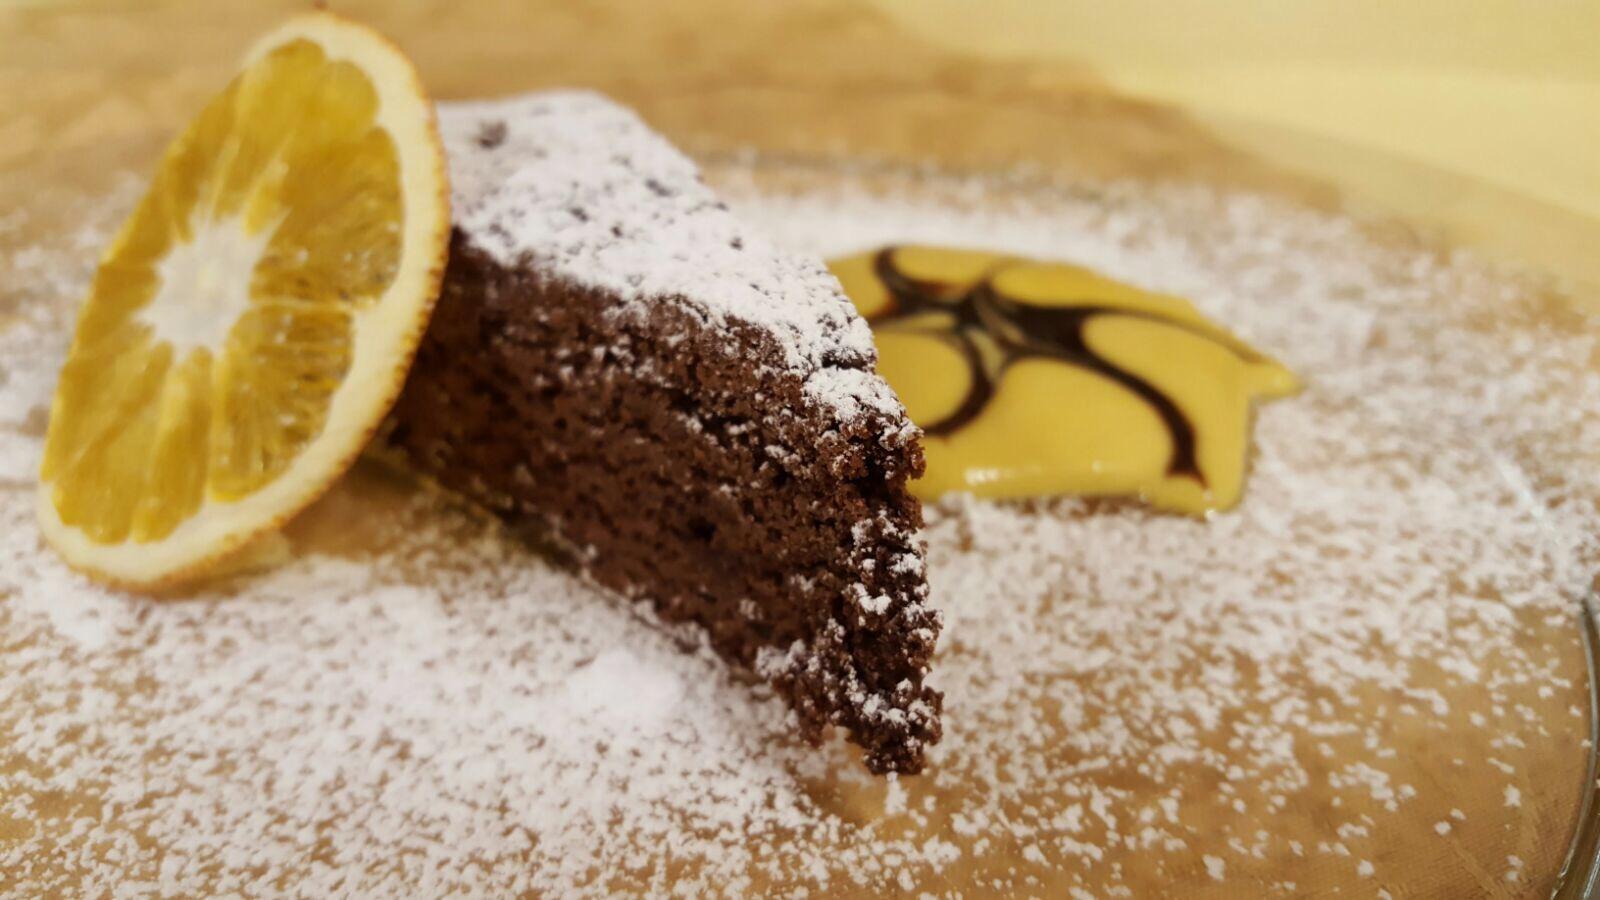 Albergo Miravalle - Torta Vegana Cioccolato e Arance